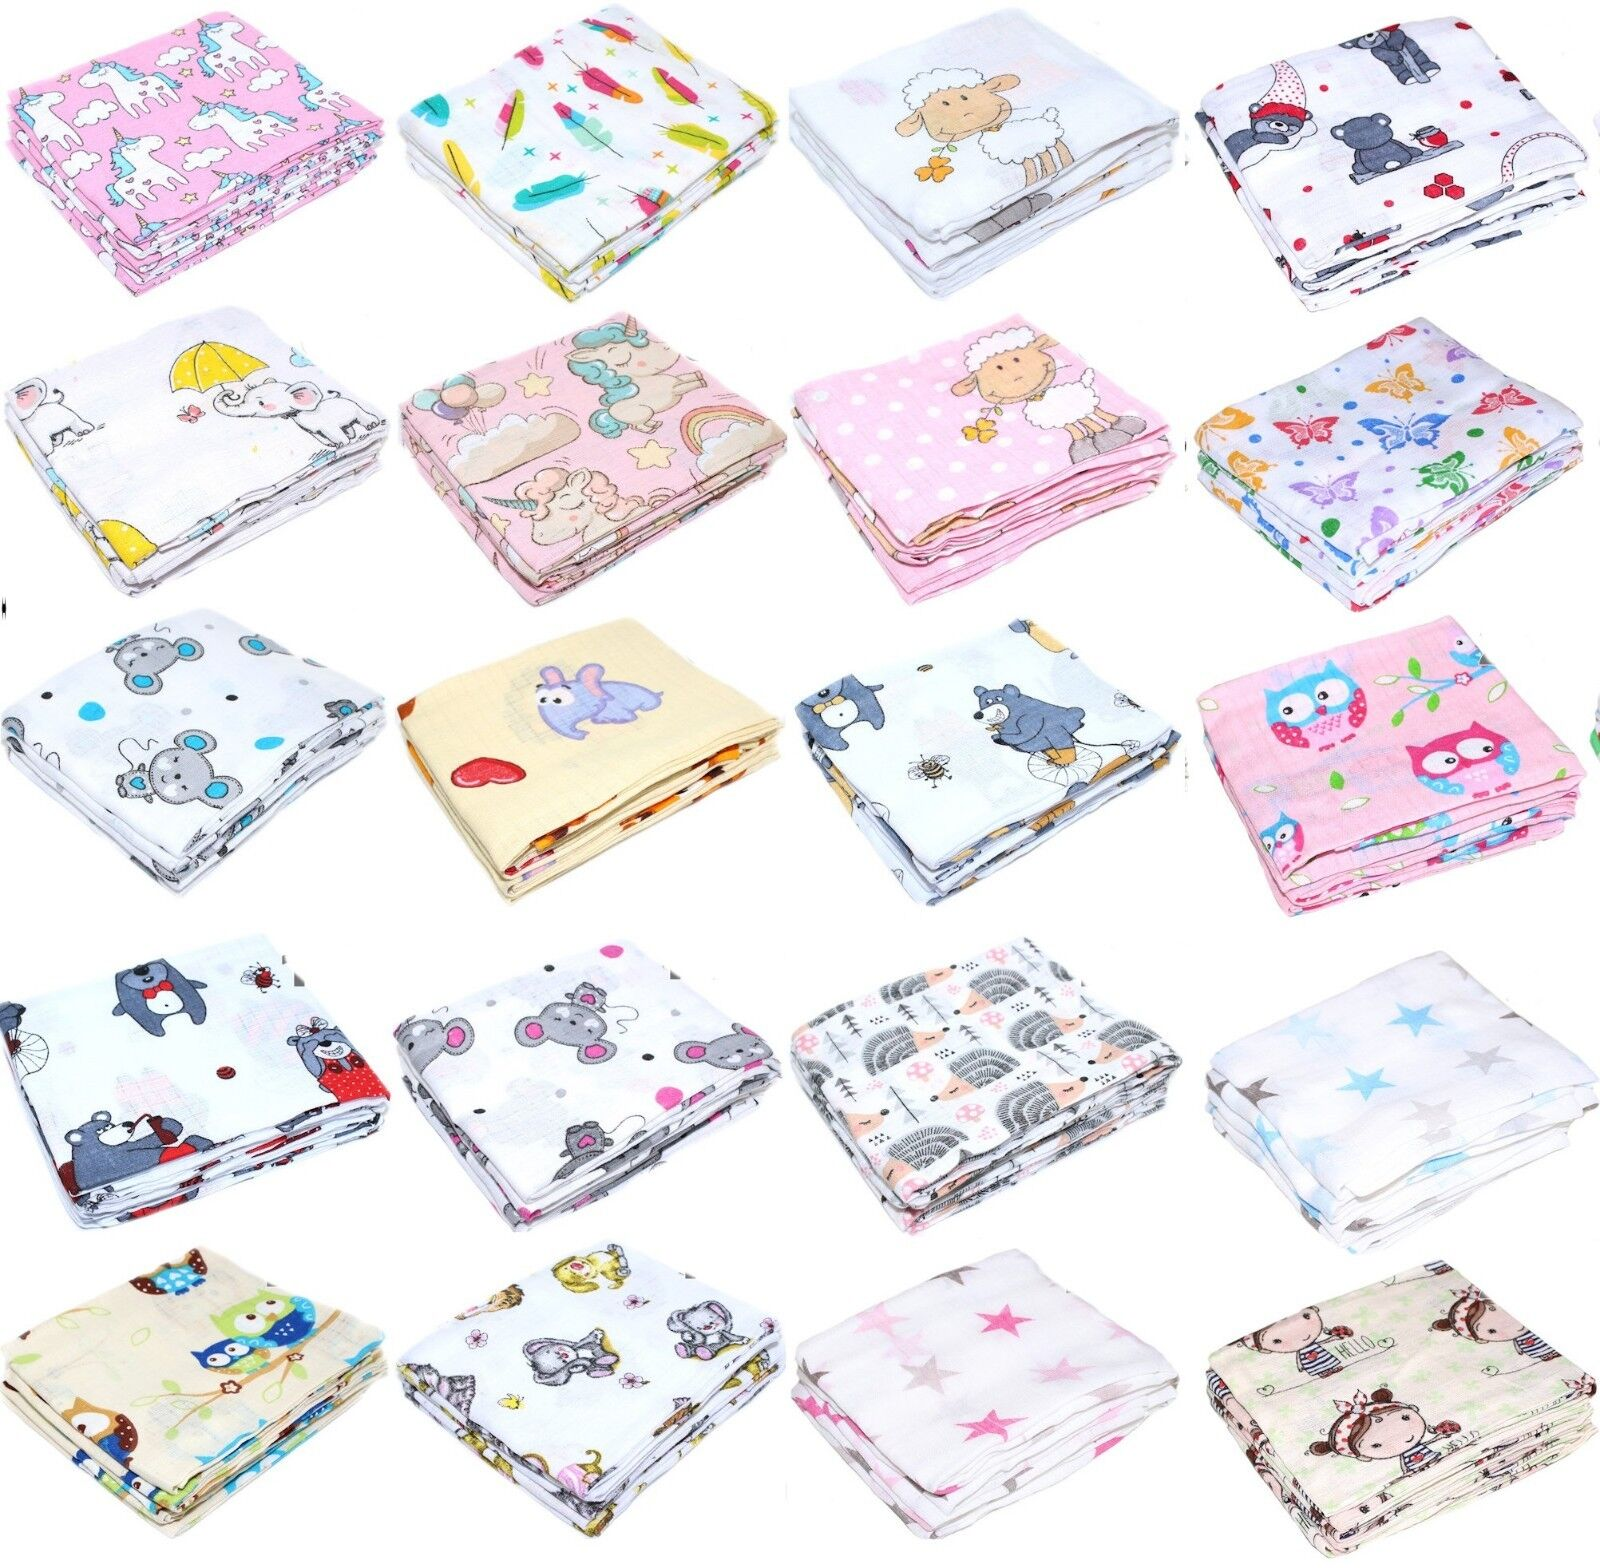 Spucktücher für Baby Kind Spucktuch  Stoffwindeln Mullwindel -5 Stück